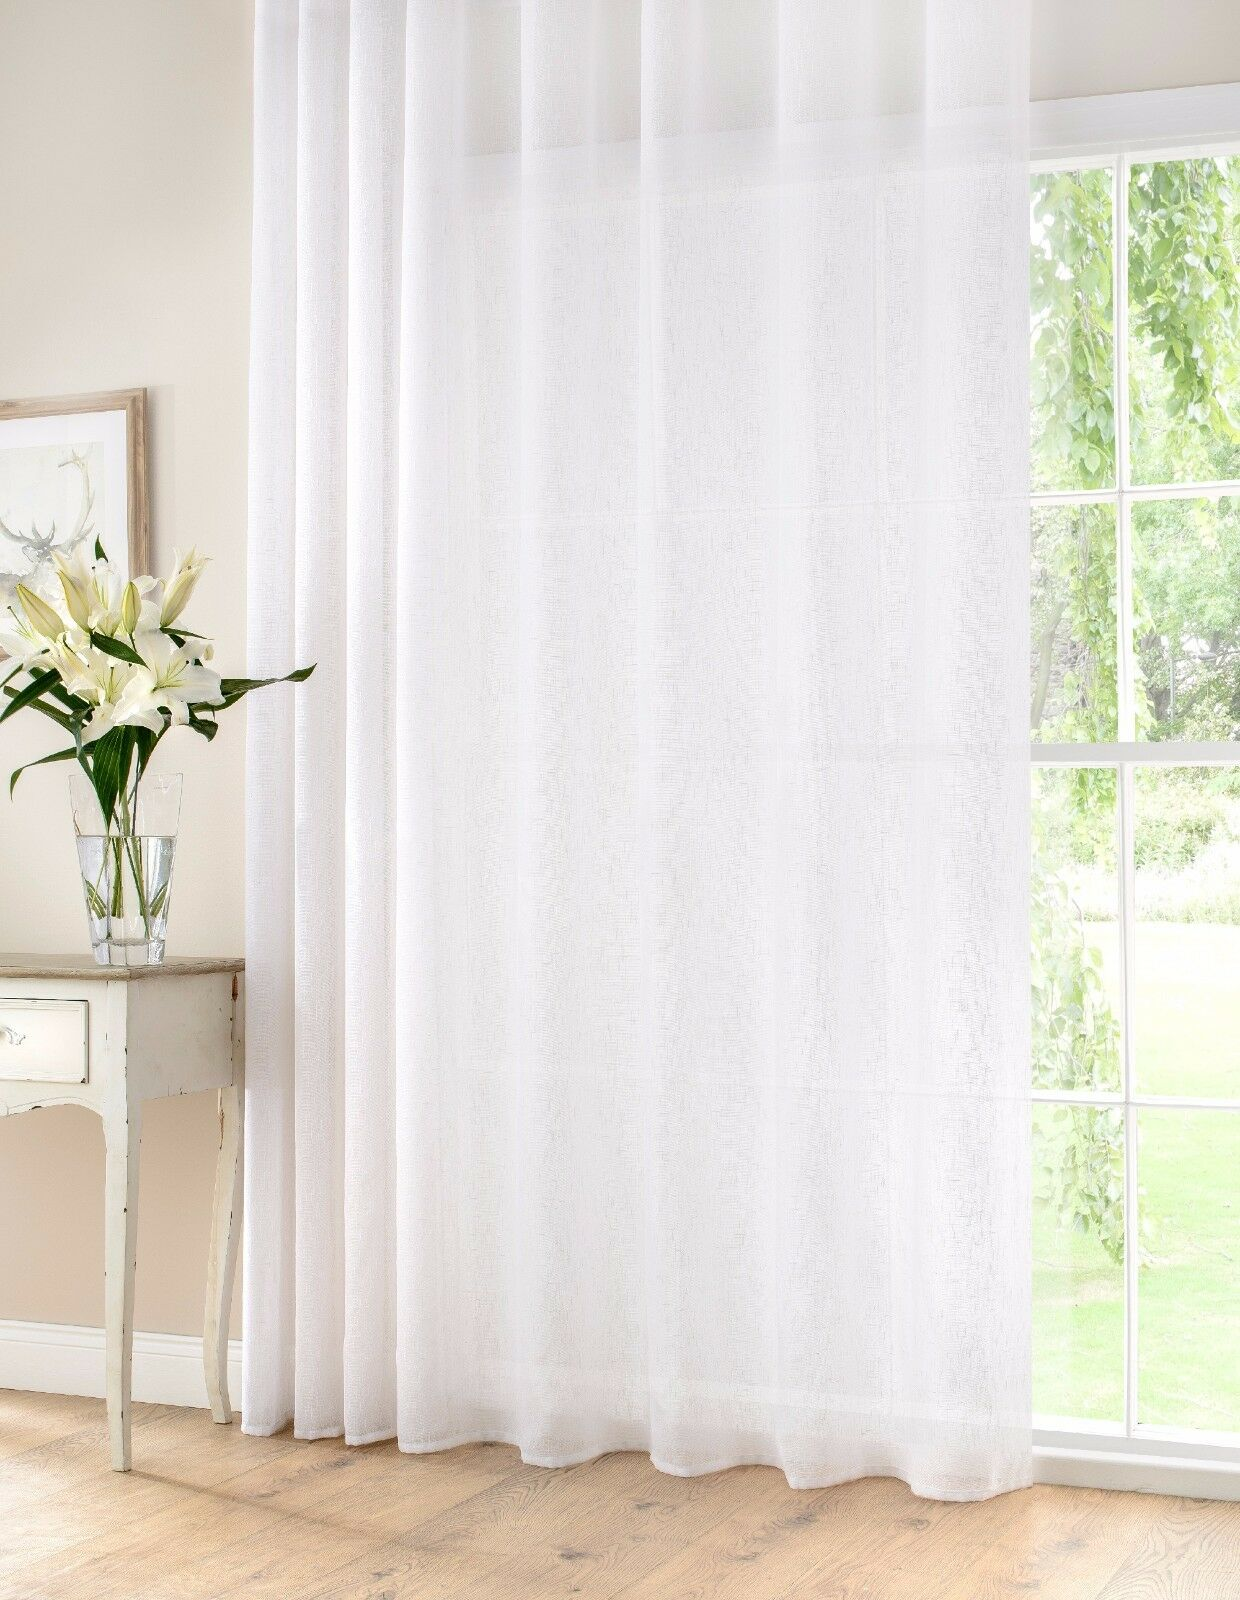 Panel de gasa Extra Ancho 72% Lino Calidad Superior semi transparentes Bi Fold patio Bay blancoo